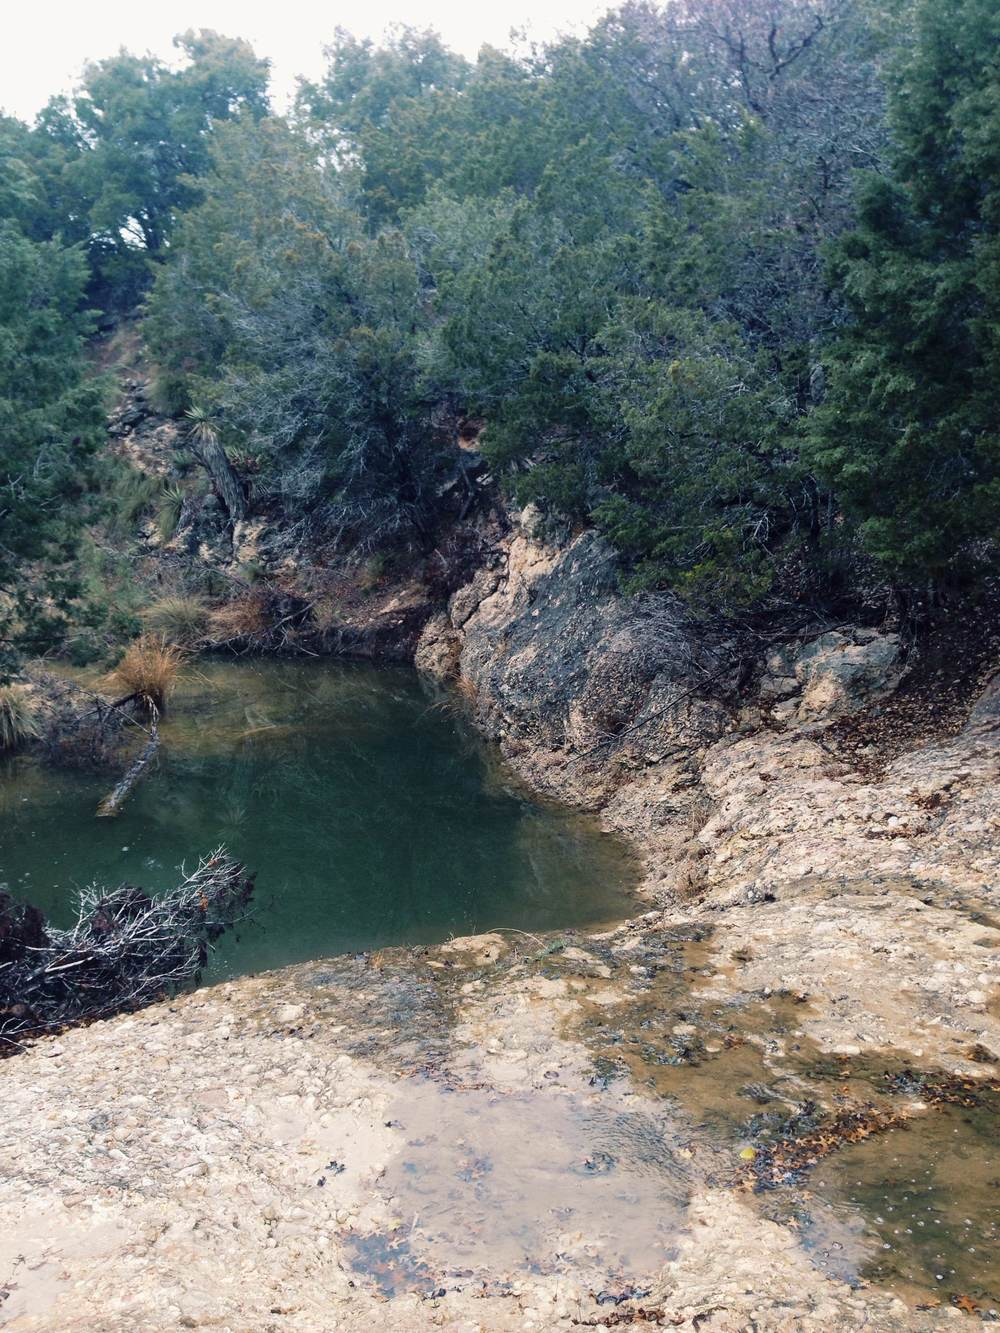 Location: Double Eagle Ranch, Burnet Co., Texas